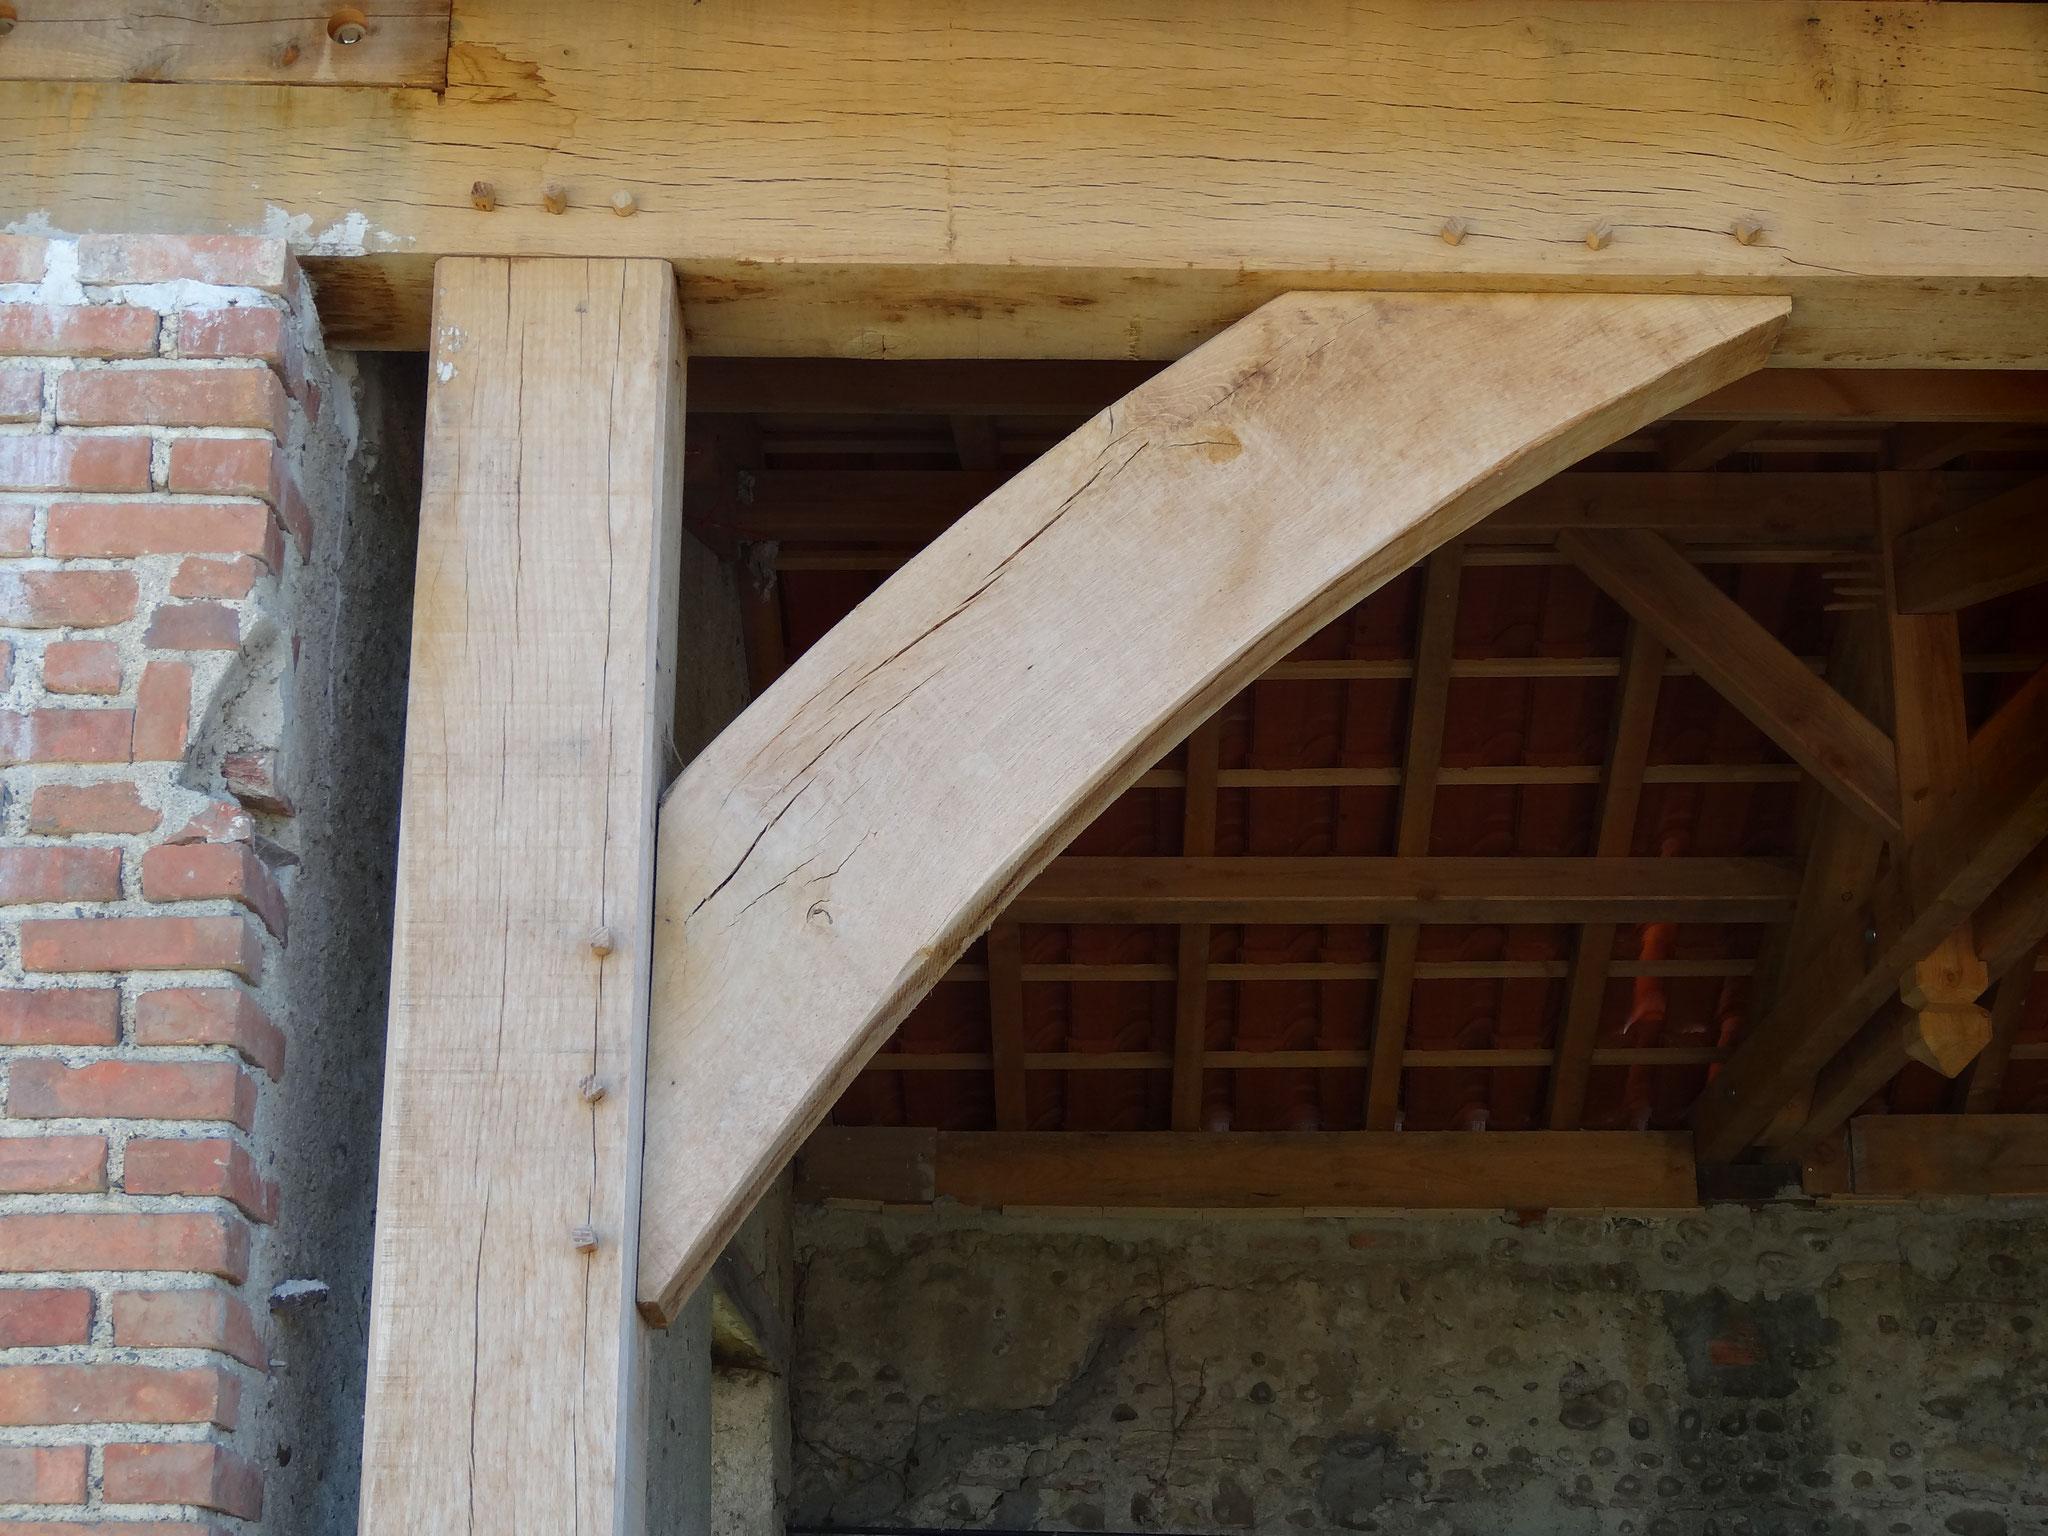 Assemblage charpente bois